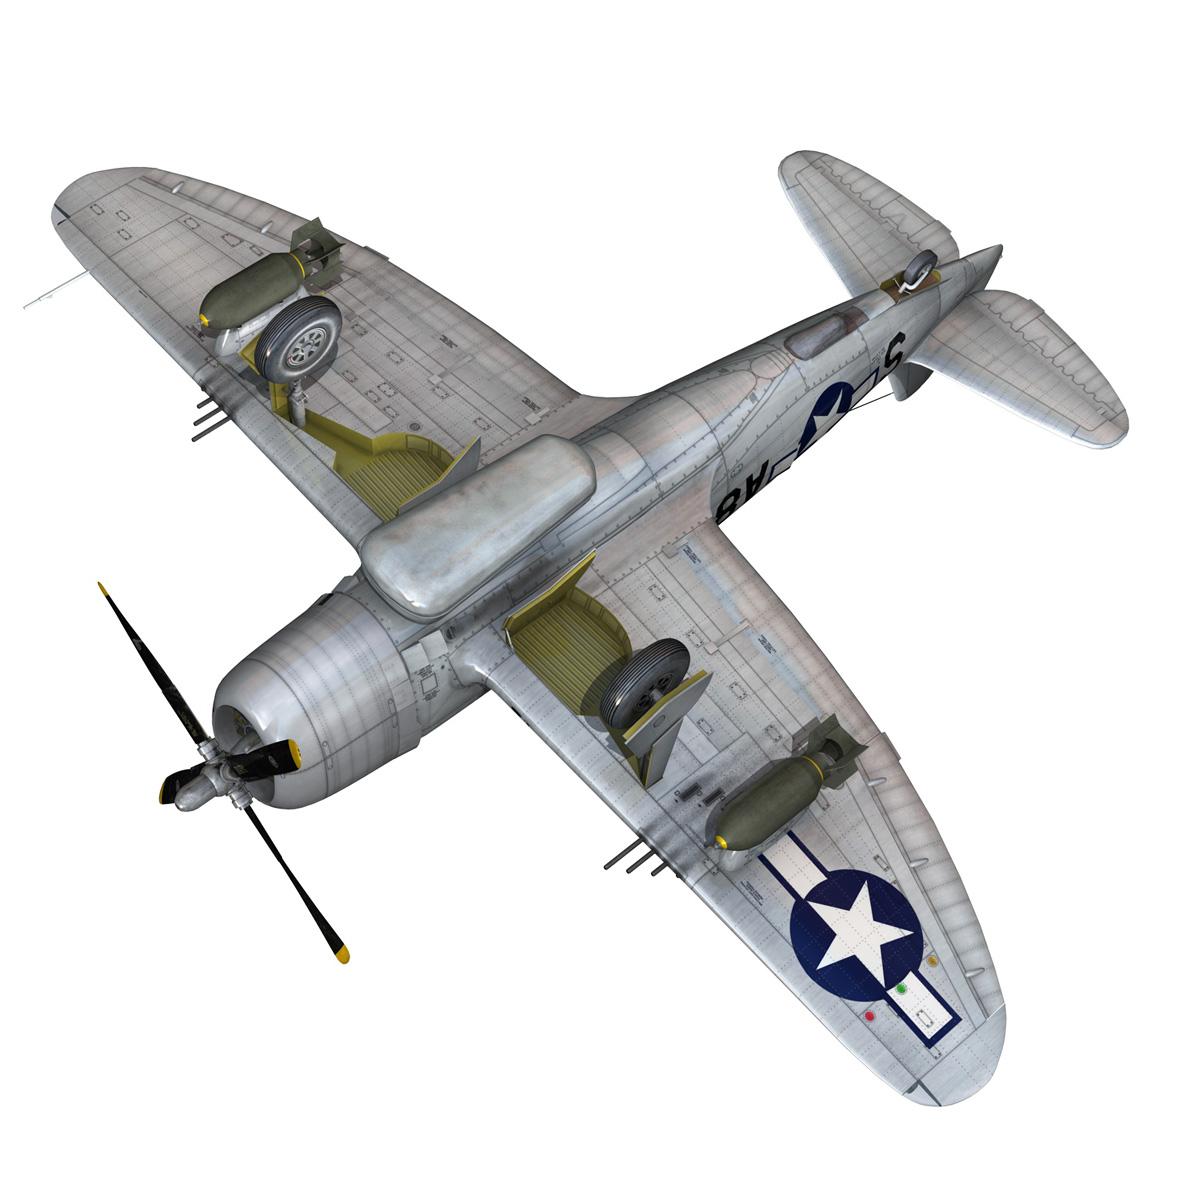 republic p-47 thunderbolt – daddy rabbit 3d model fbx c4d lwo obj 272704